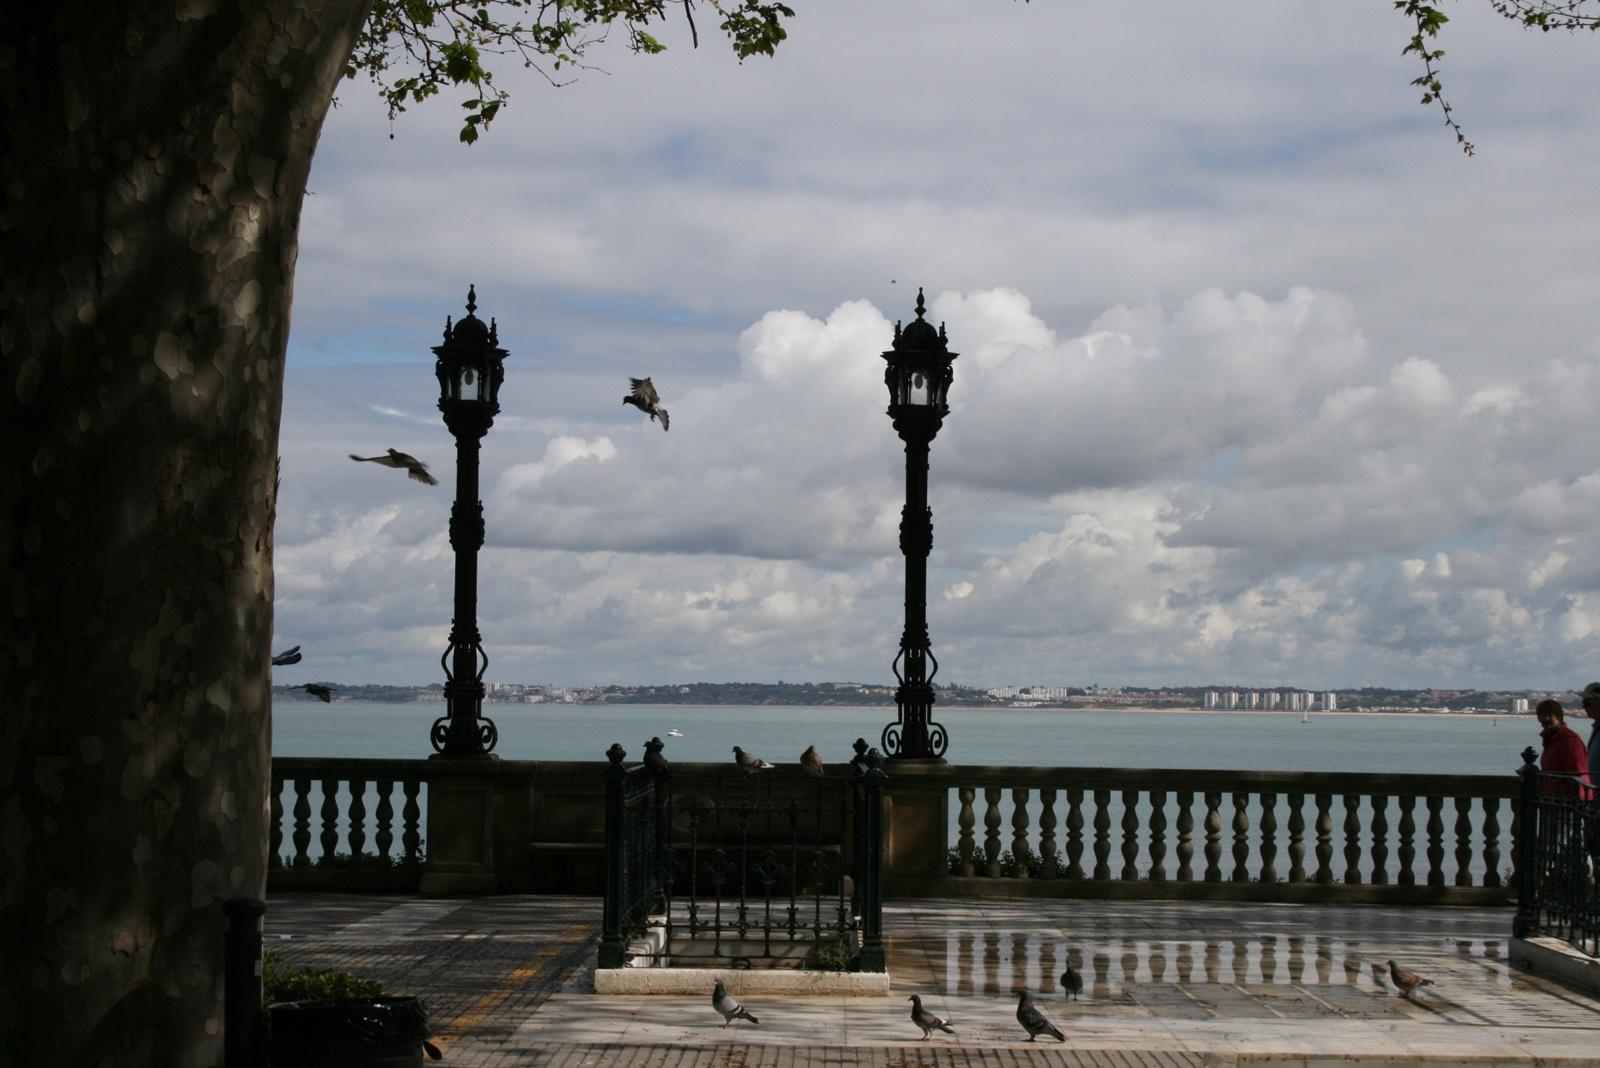 El mar a vista de palomas